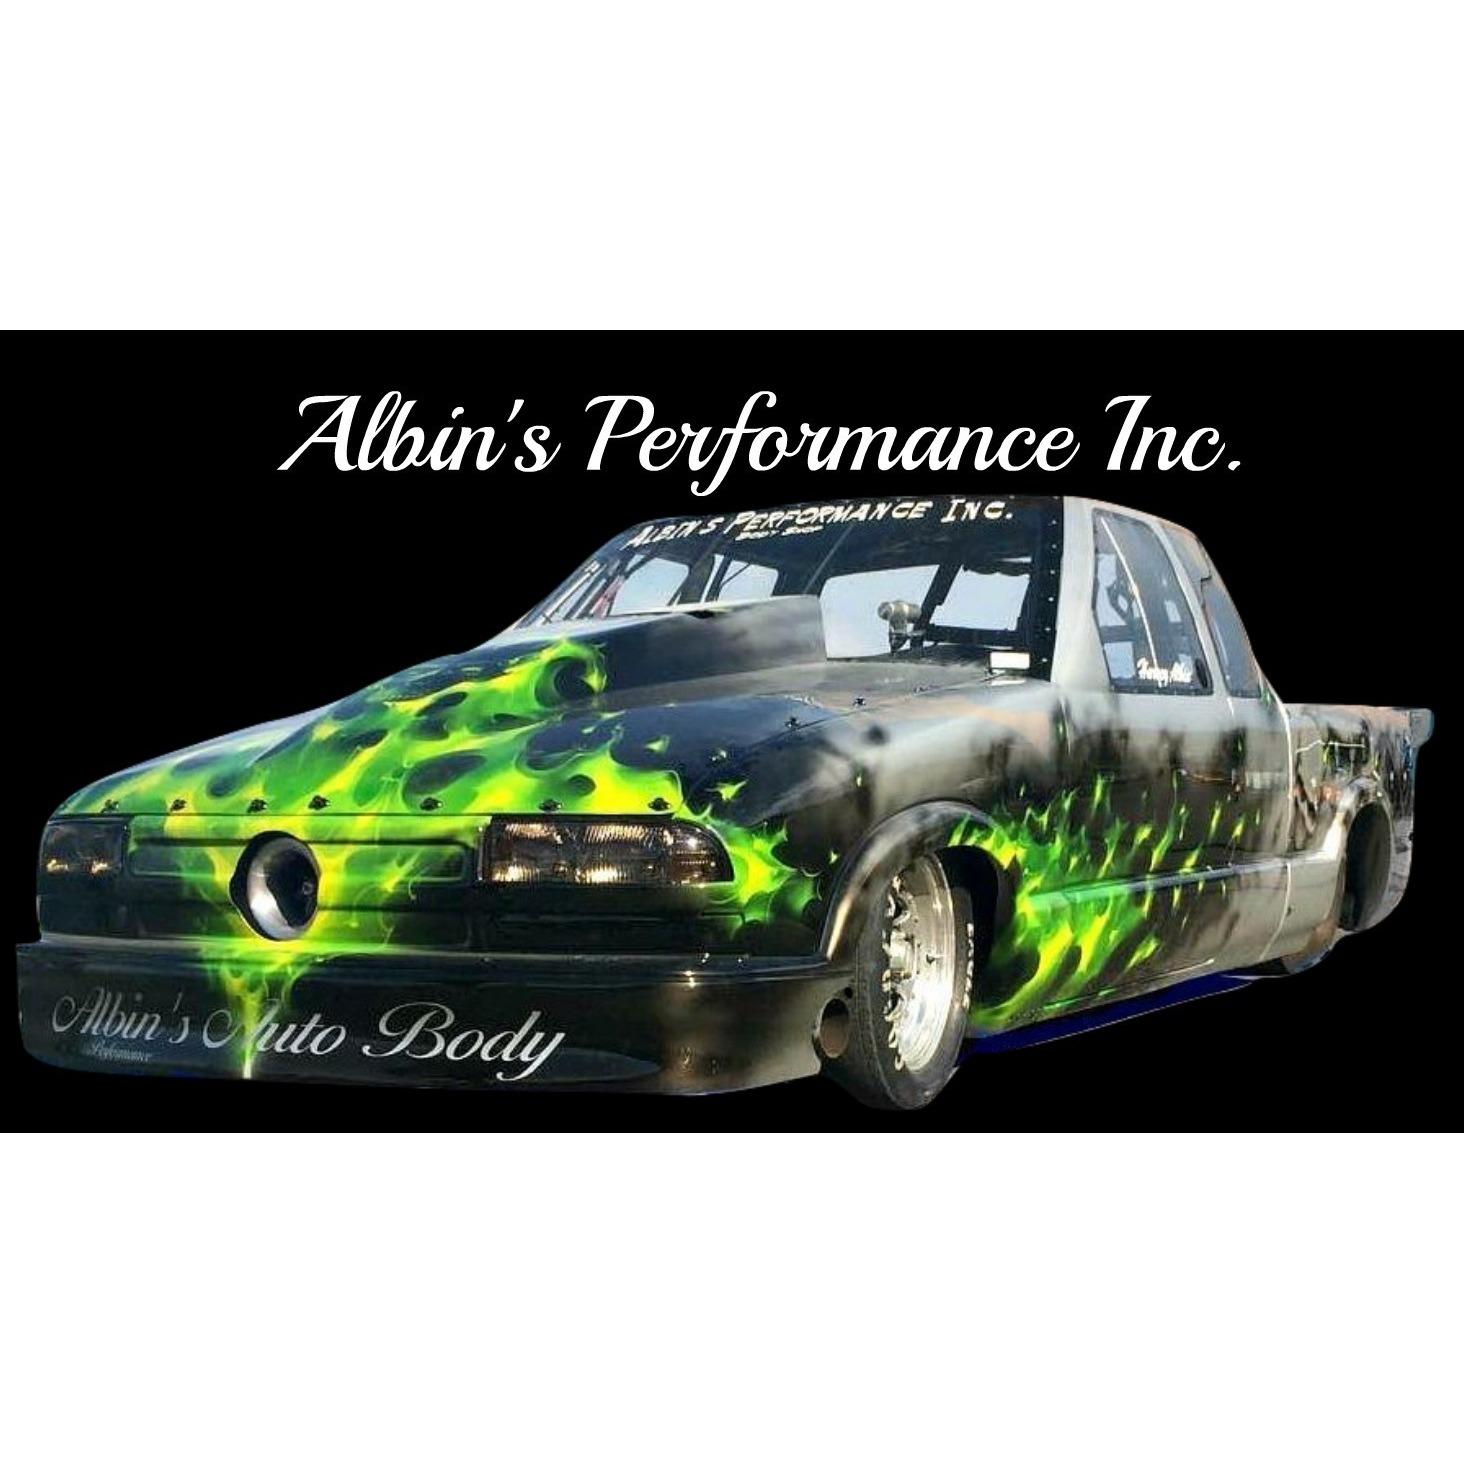 Albin's Performance Inc image 1